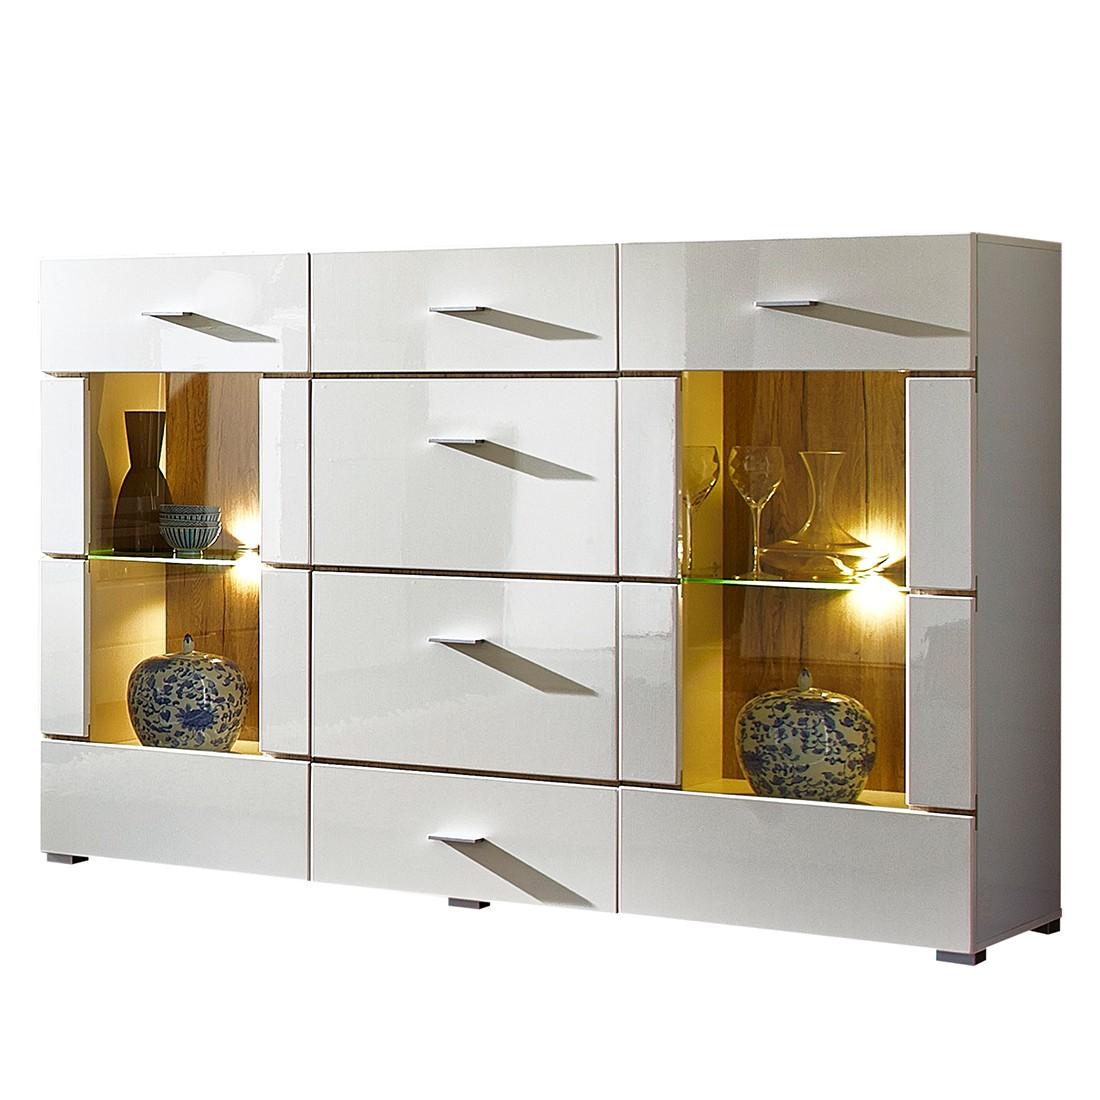 Energie A Dressoir Roomconcept Inclusief Ledverlichting Hoogglans Wit Roomscape in de aanbieding